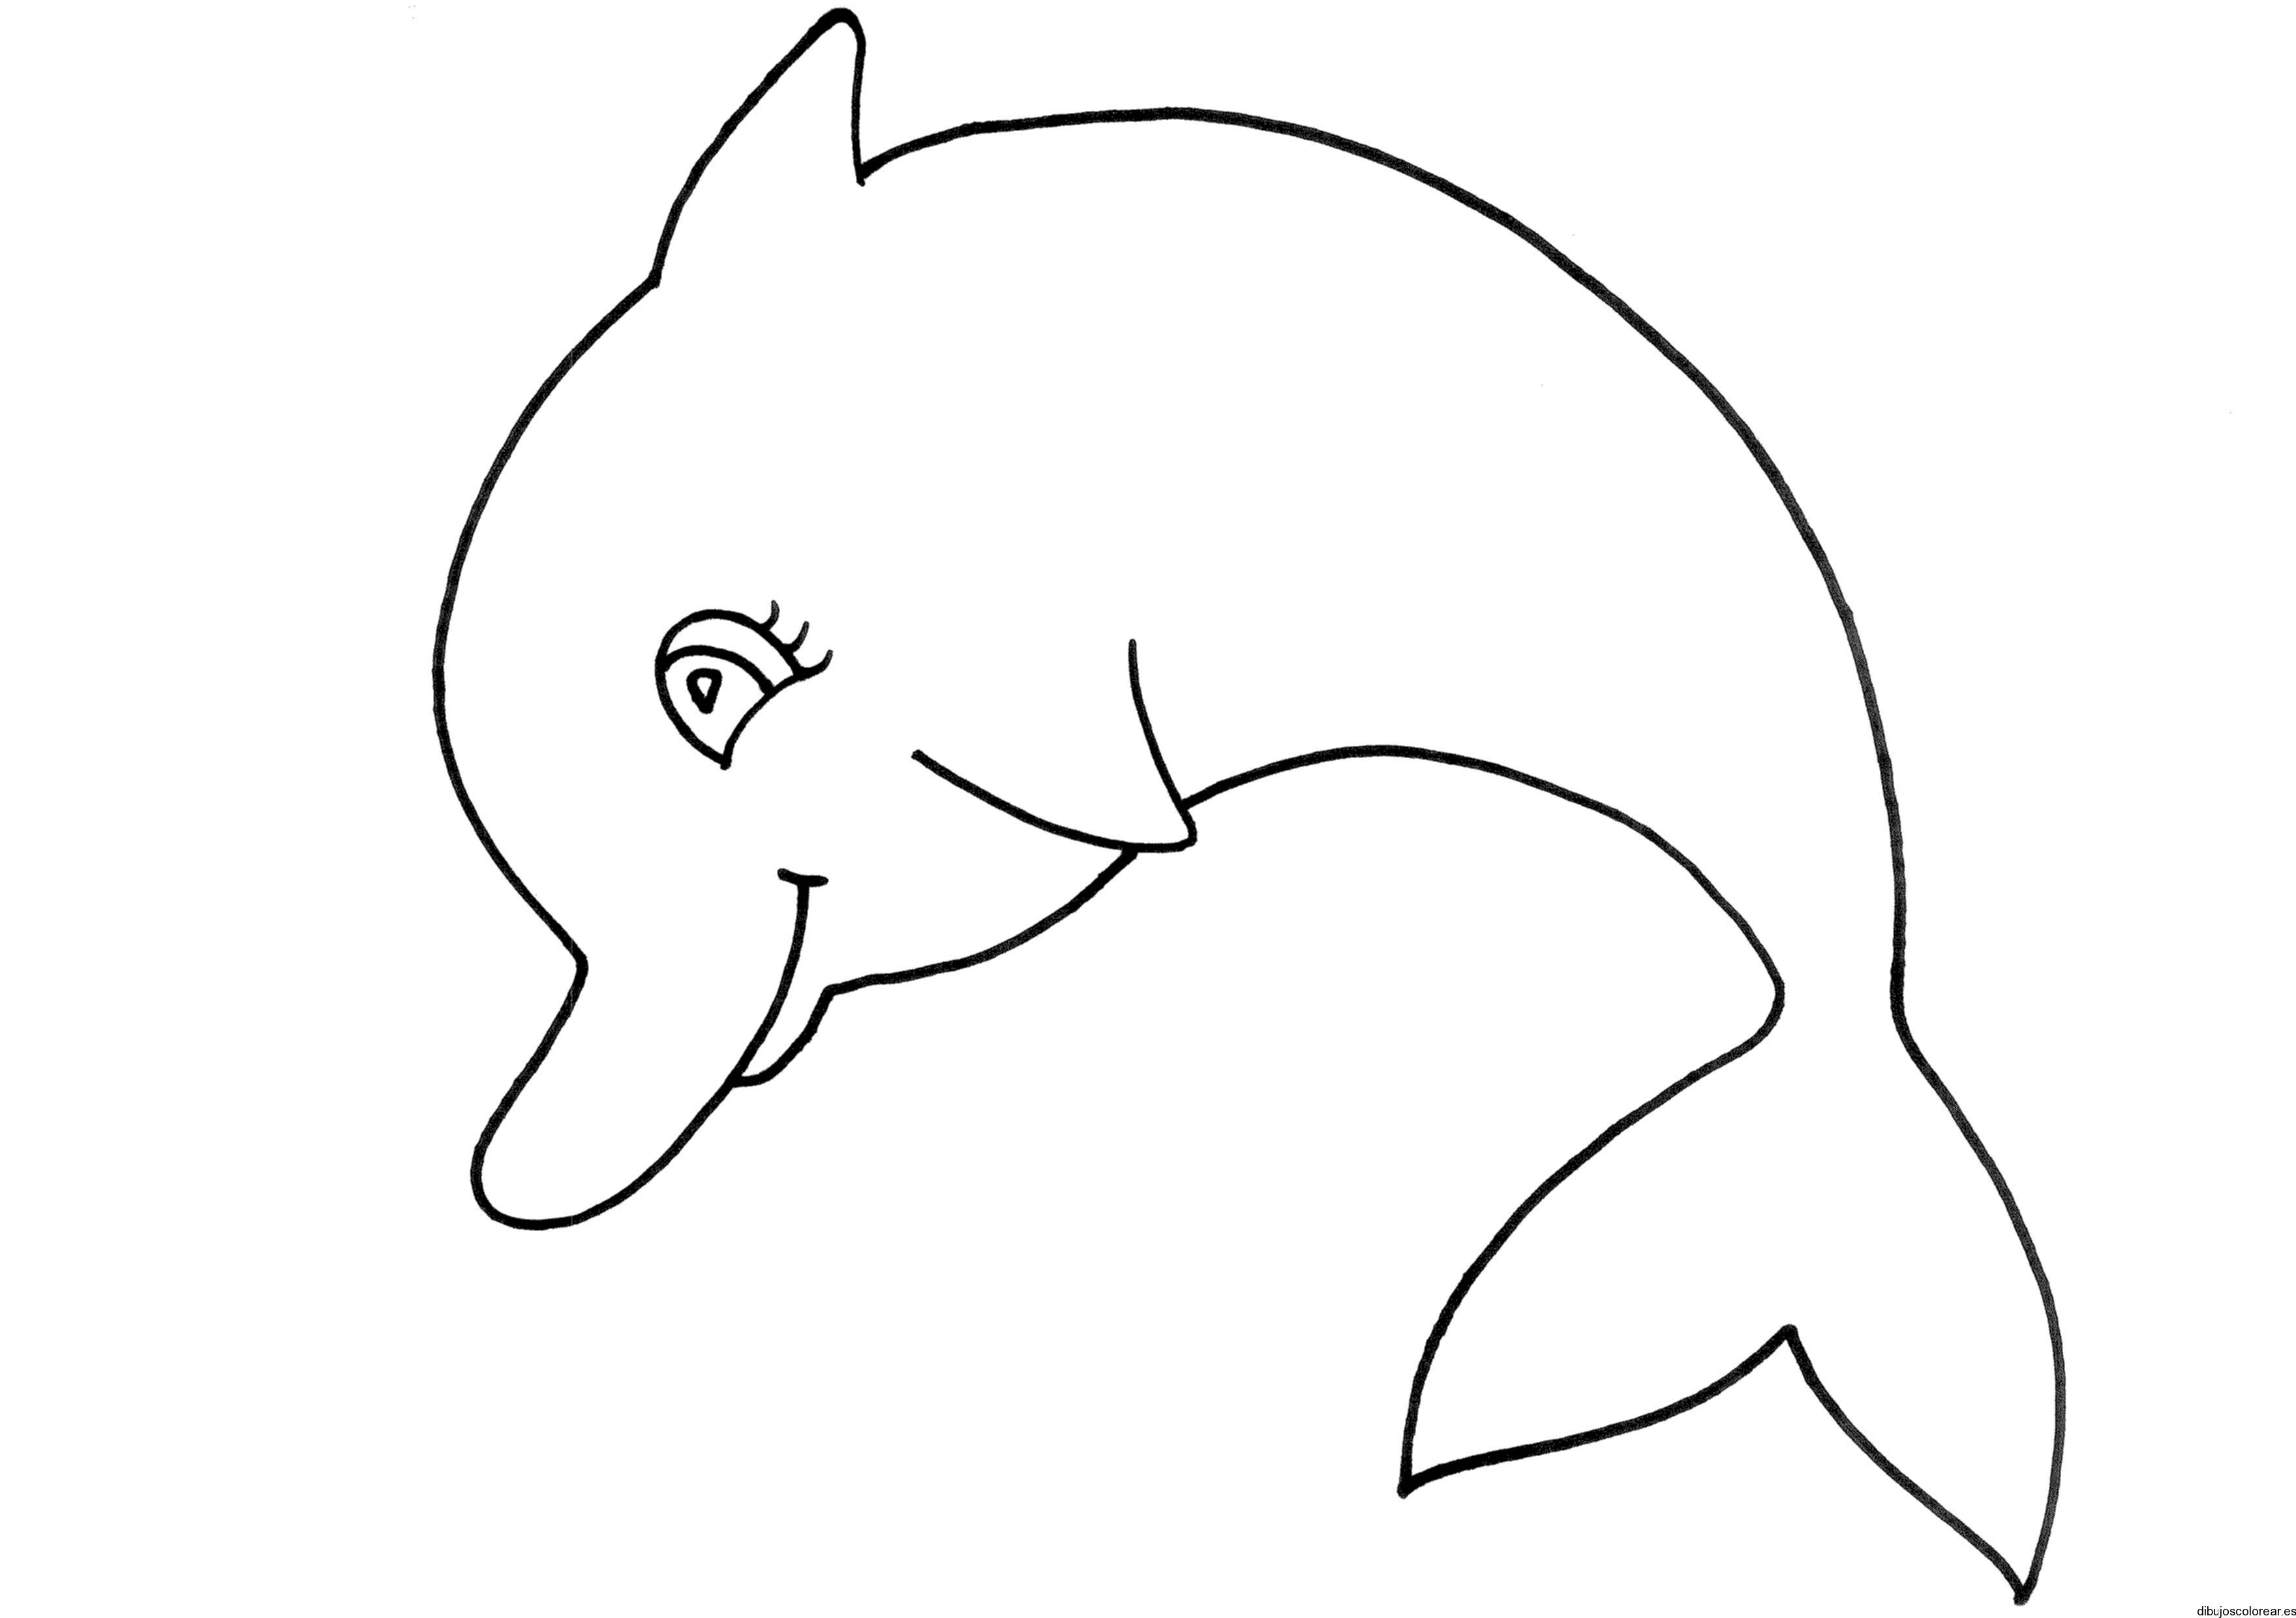 imagenes - Dibujos de delfin | ABRIL | Pinterest | Imagenes dibujos ...